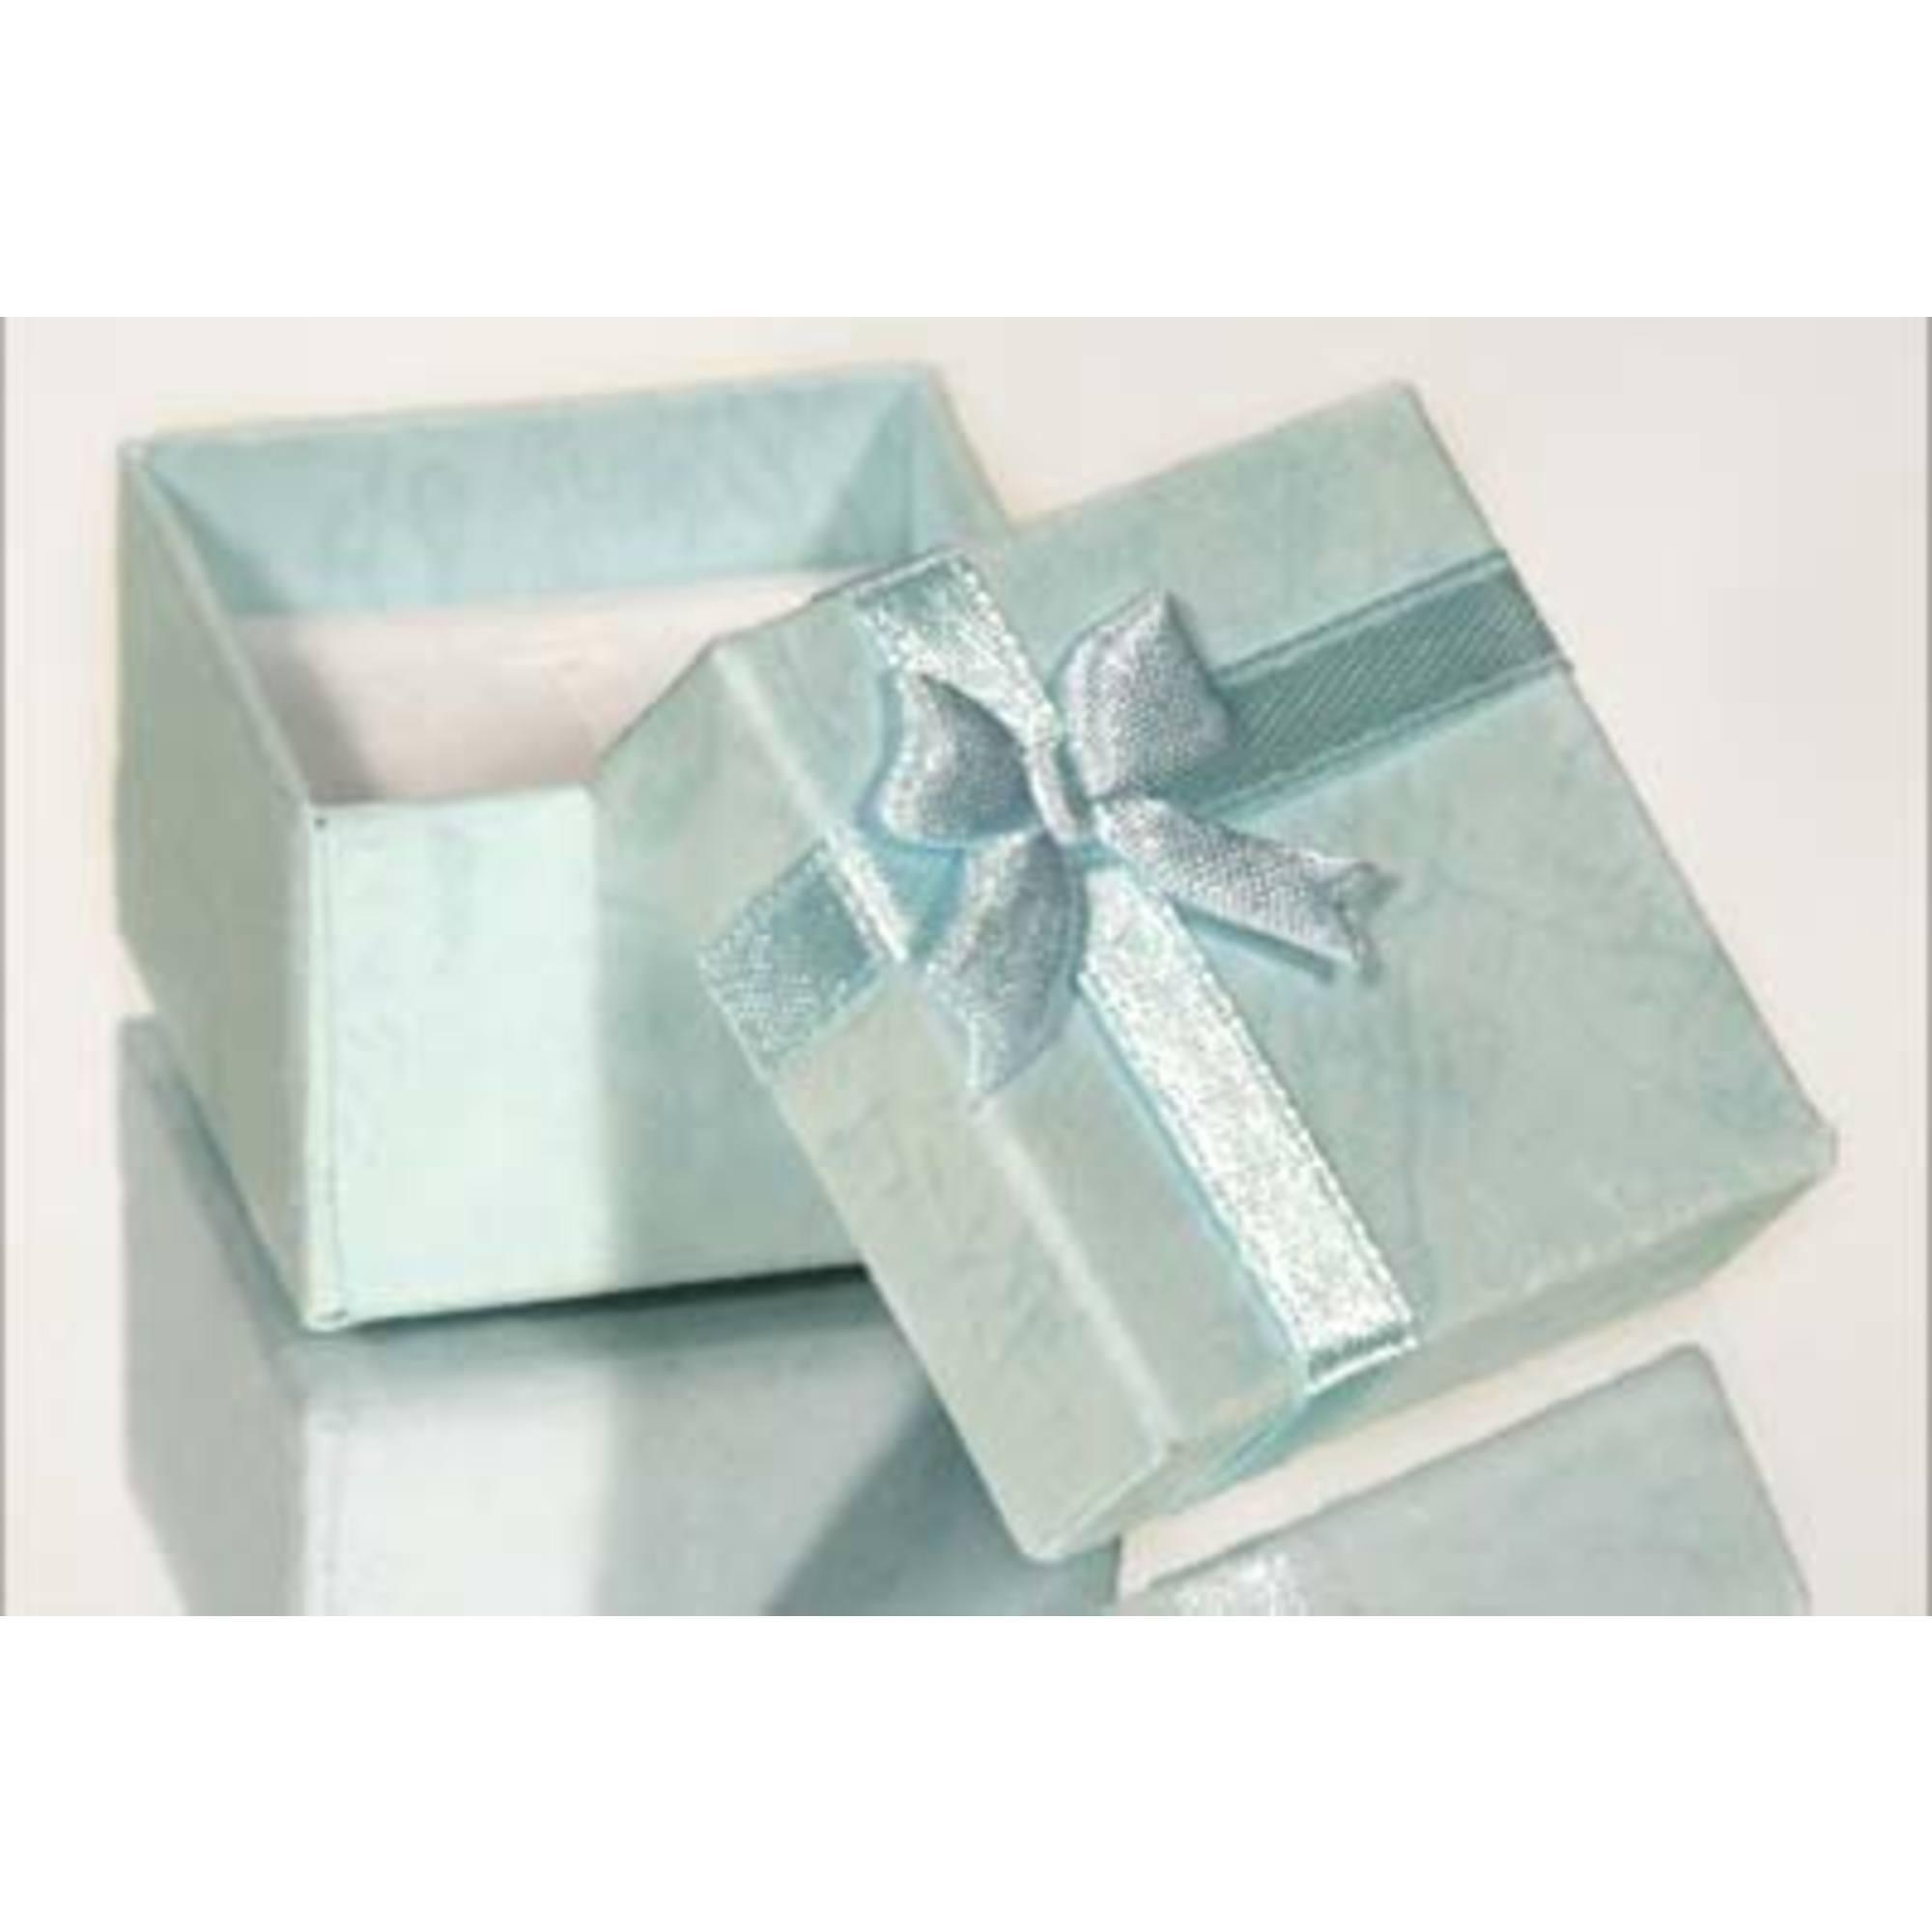 Jewellery Gift Box - Blue